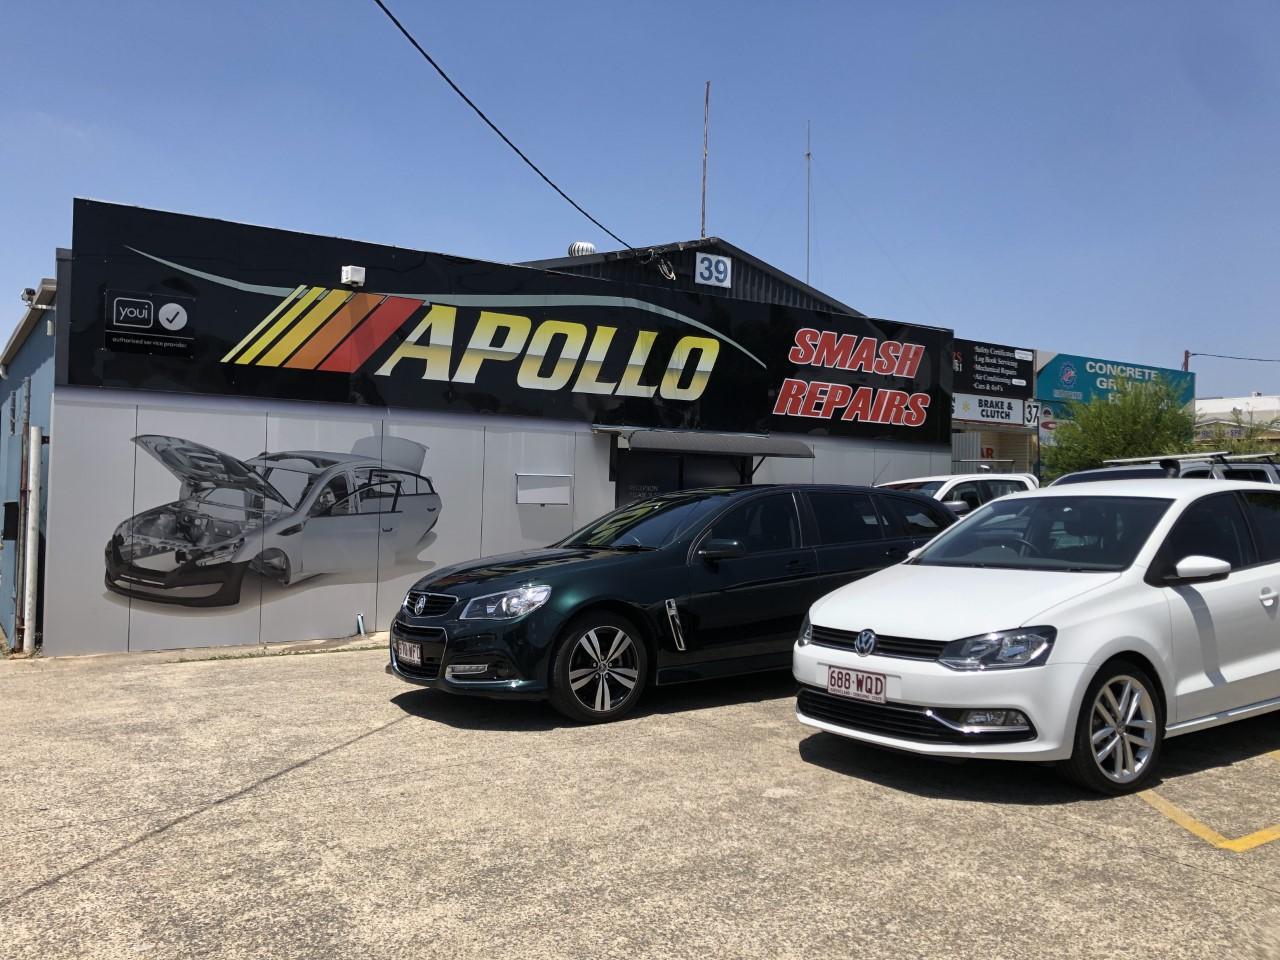 Apollo Smash Repairs Photos